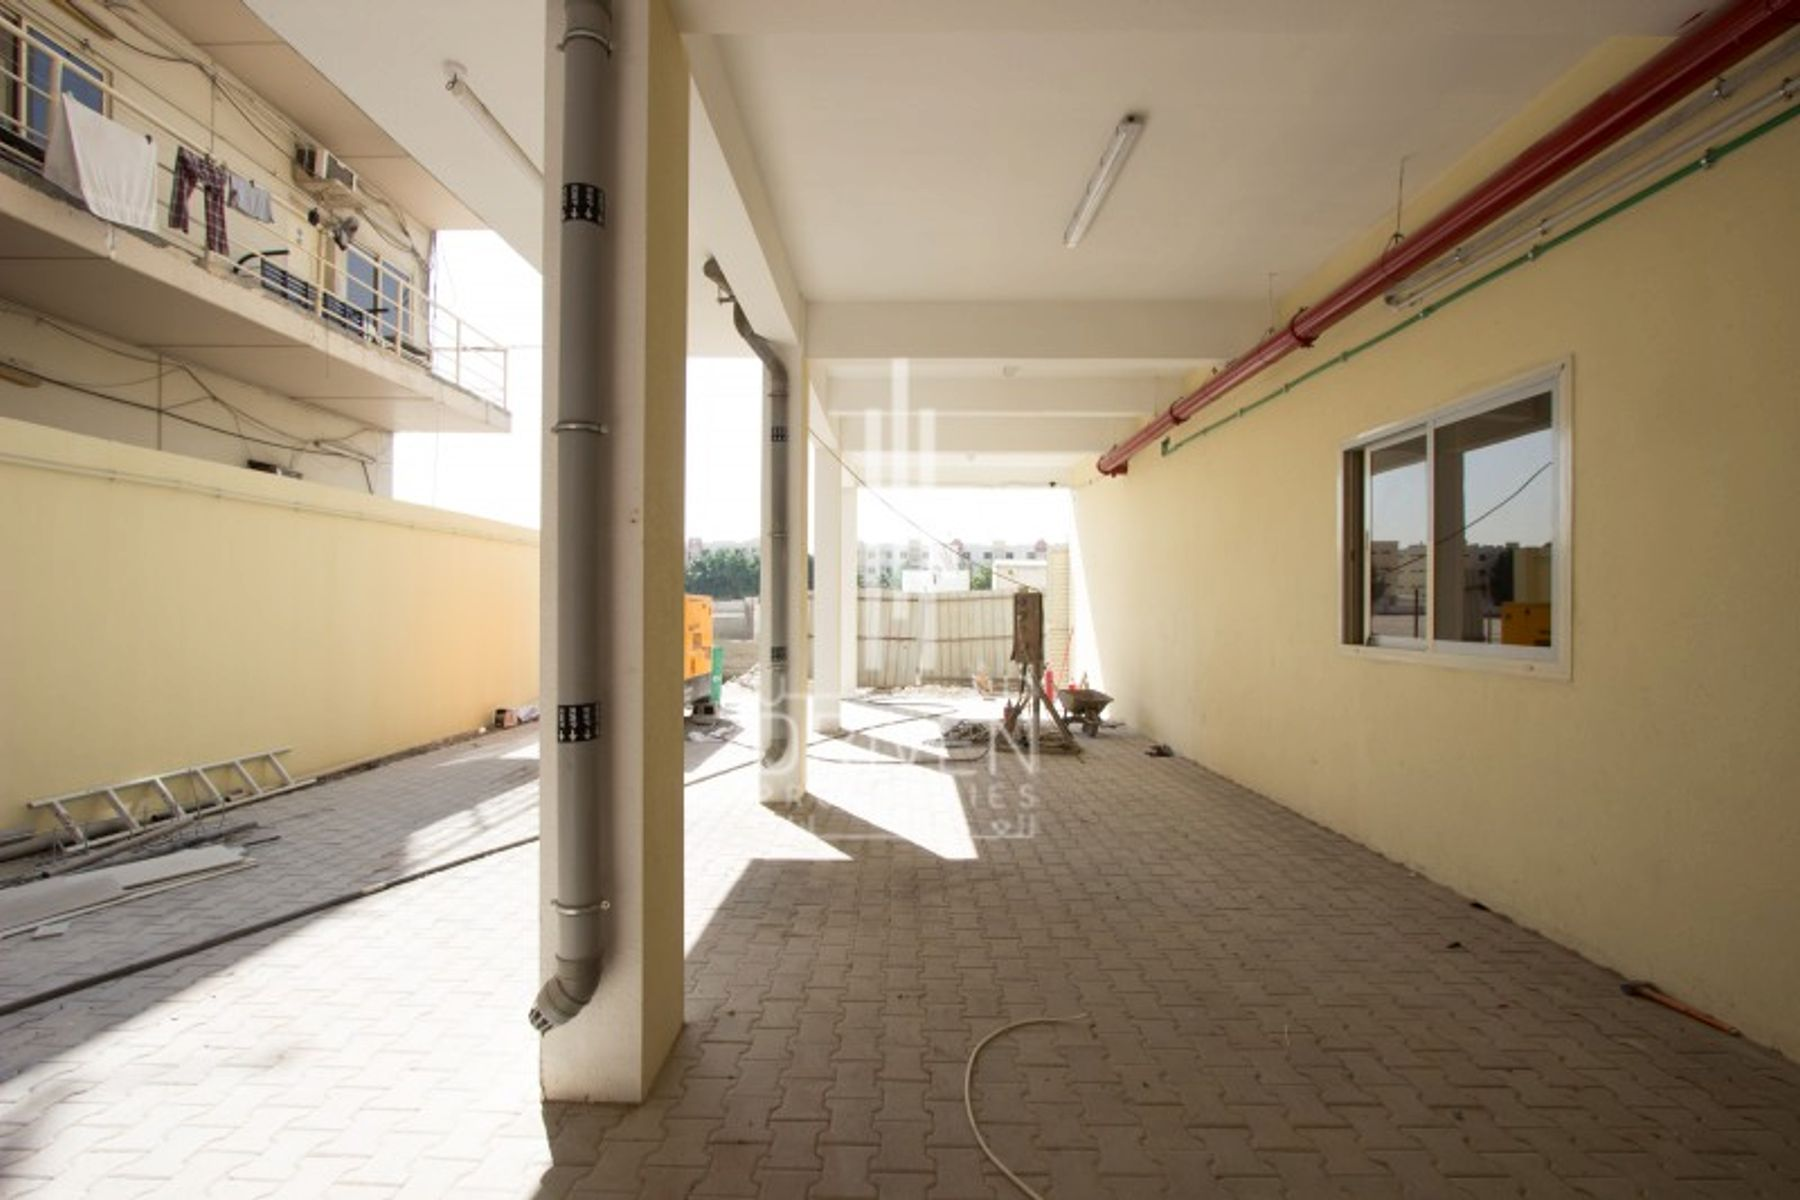 Labour camp for Rent in Jebel Ali Industrial 1, Jebel Ali